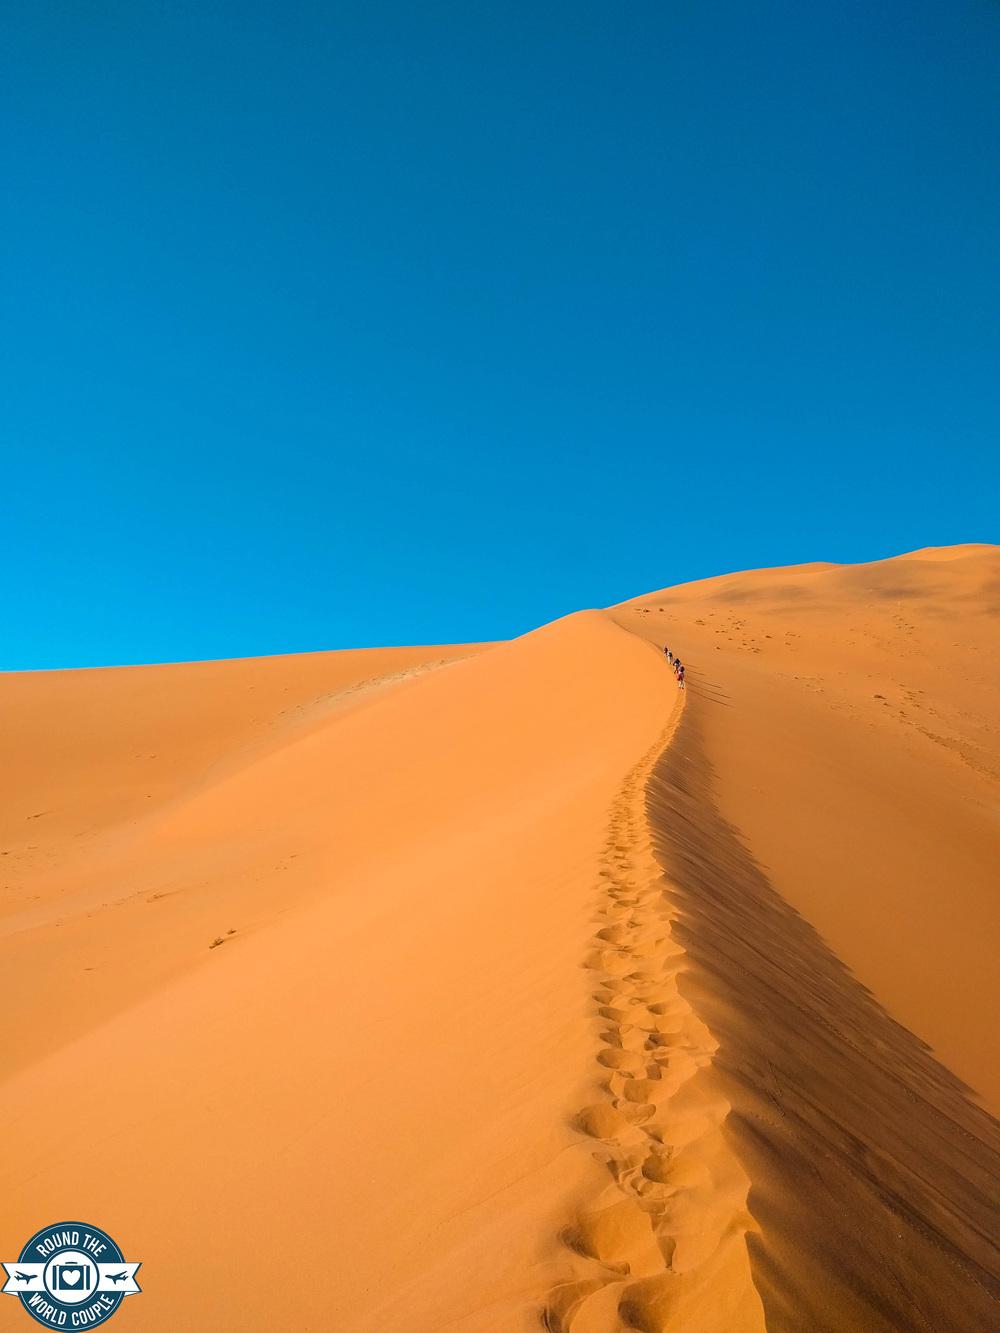 Big Daddy Dune, Soussusvlei, Namibia